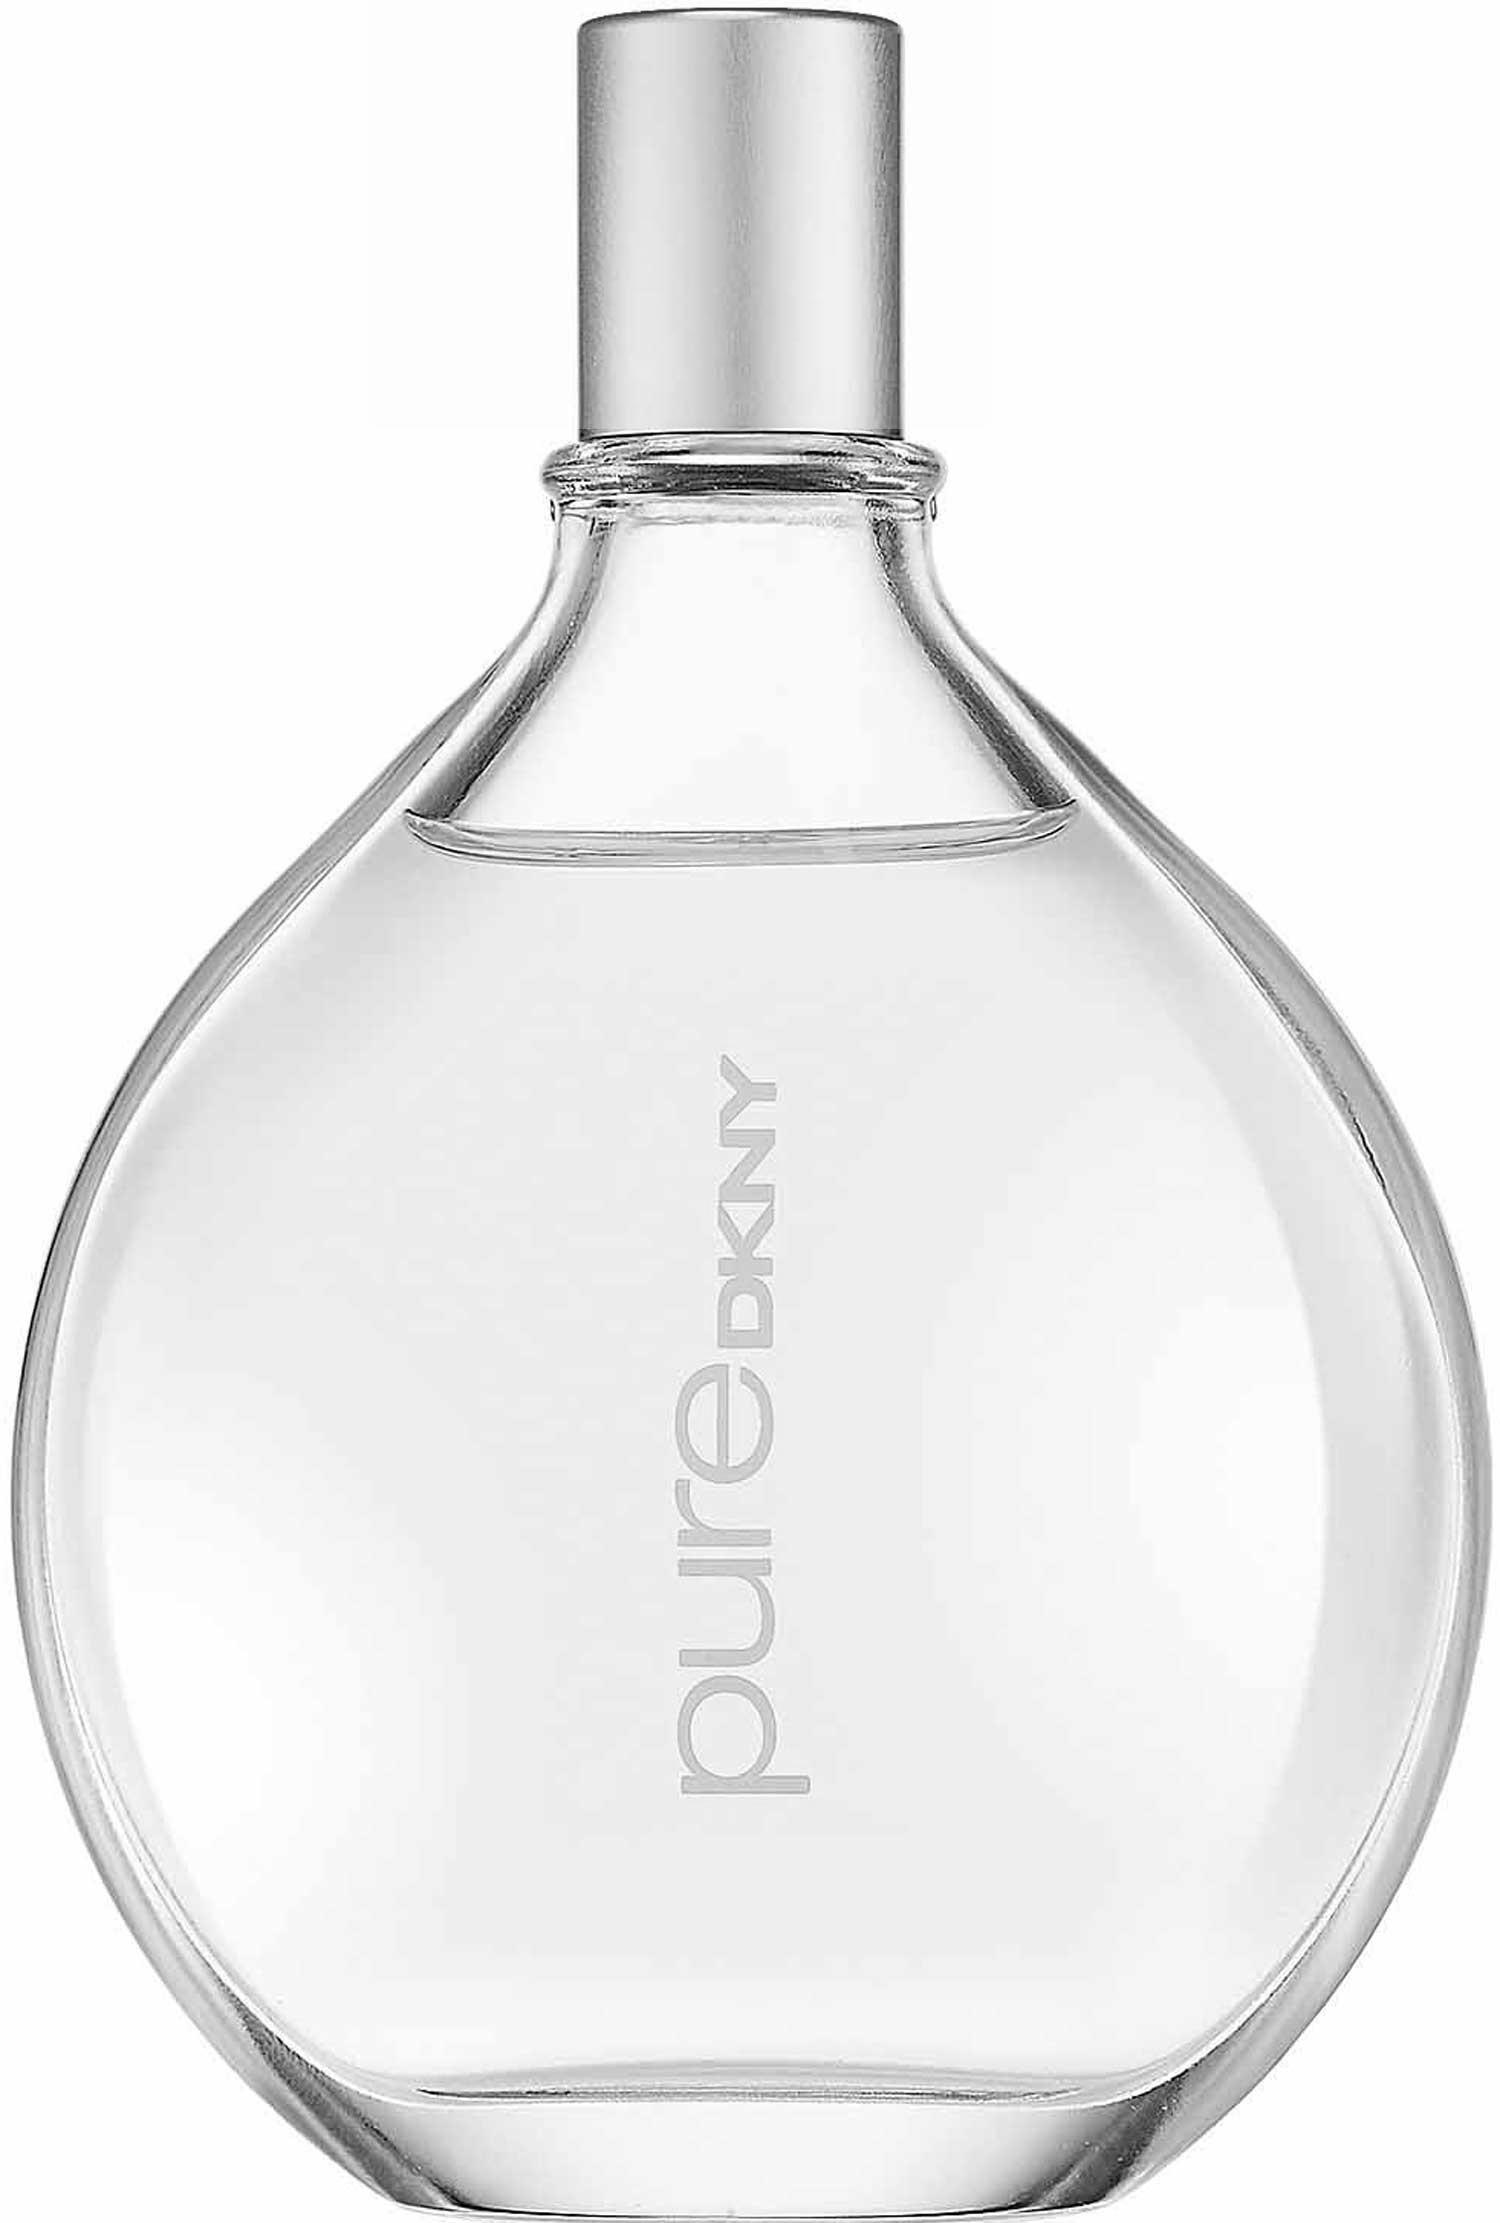 Donna Karan Pure парфюмированная вода 100мл тестер (Донна Каран Пьюр)